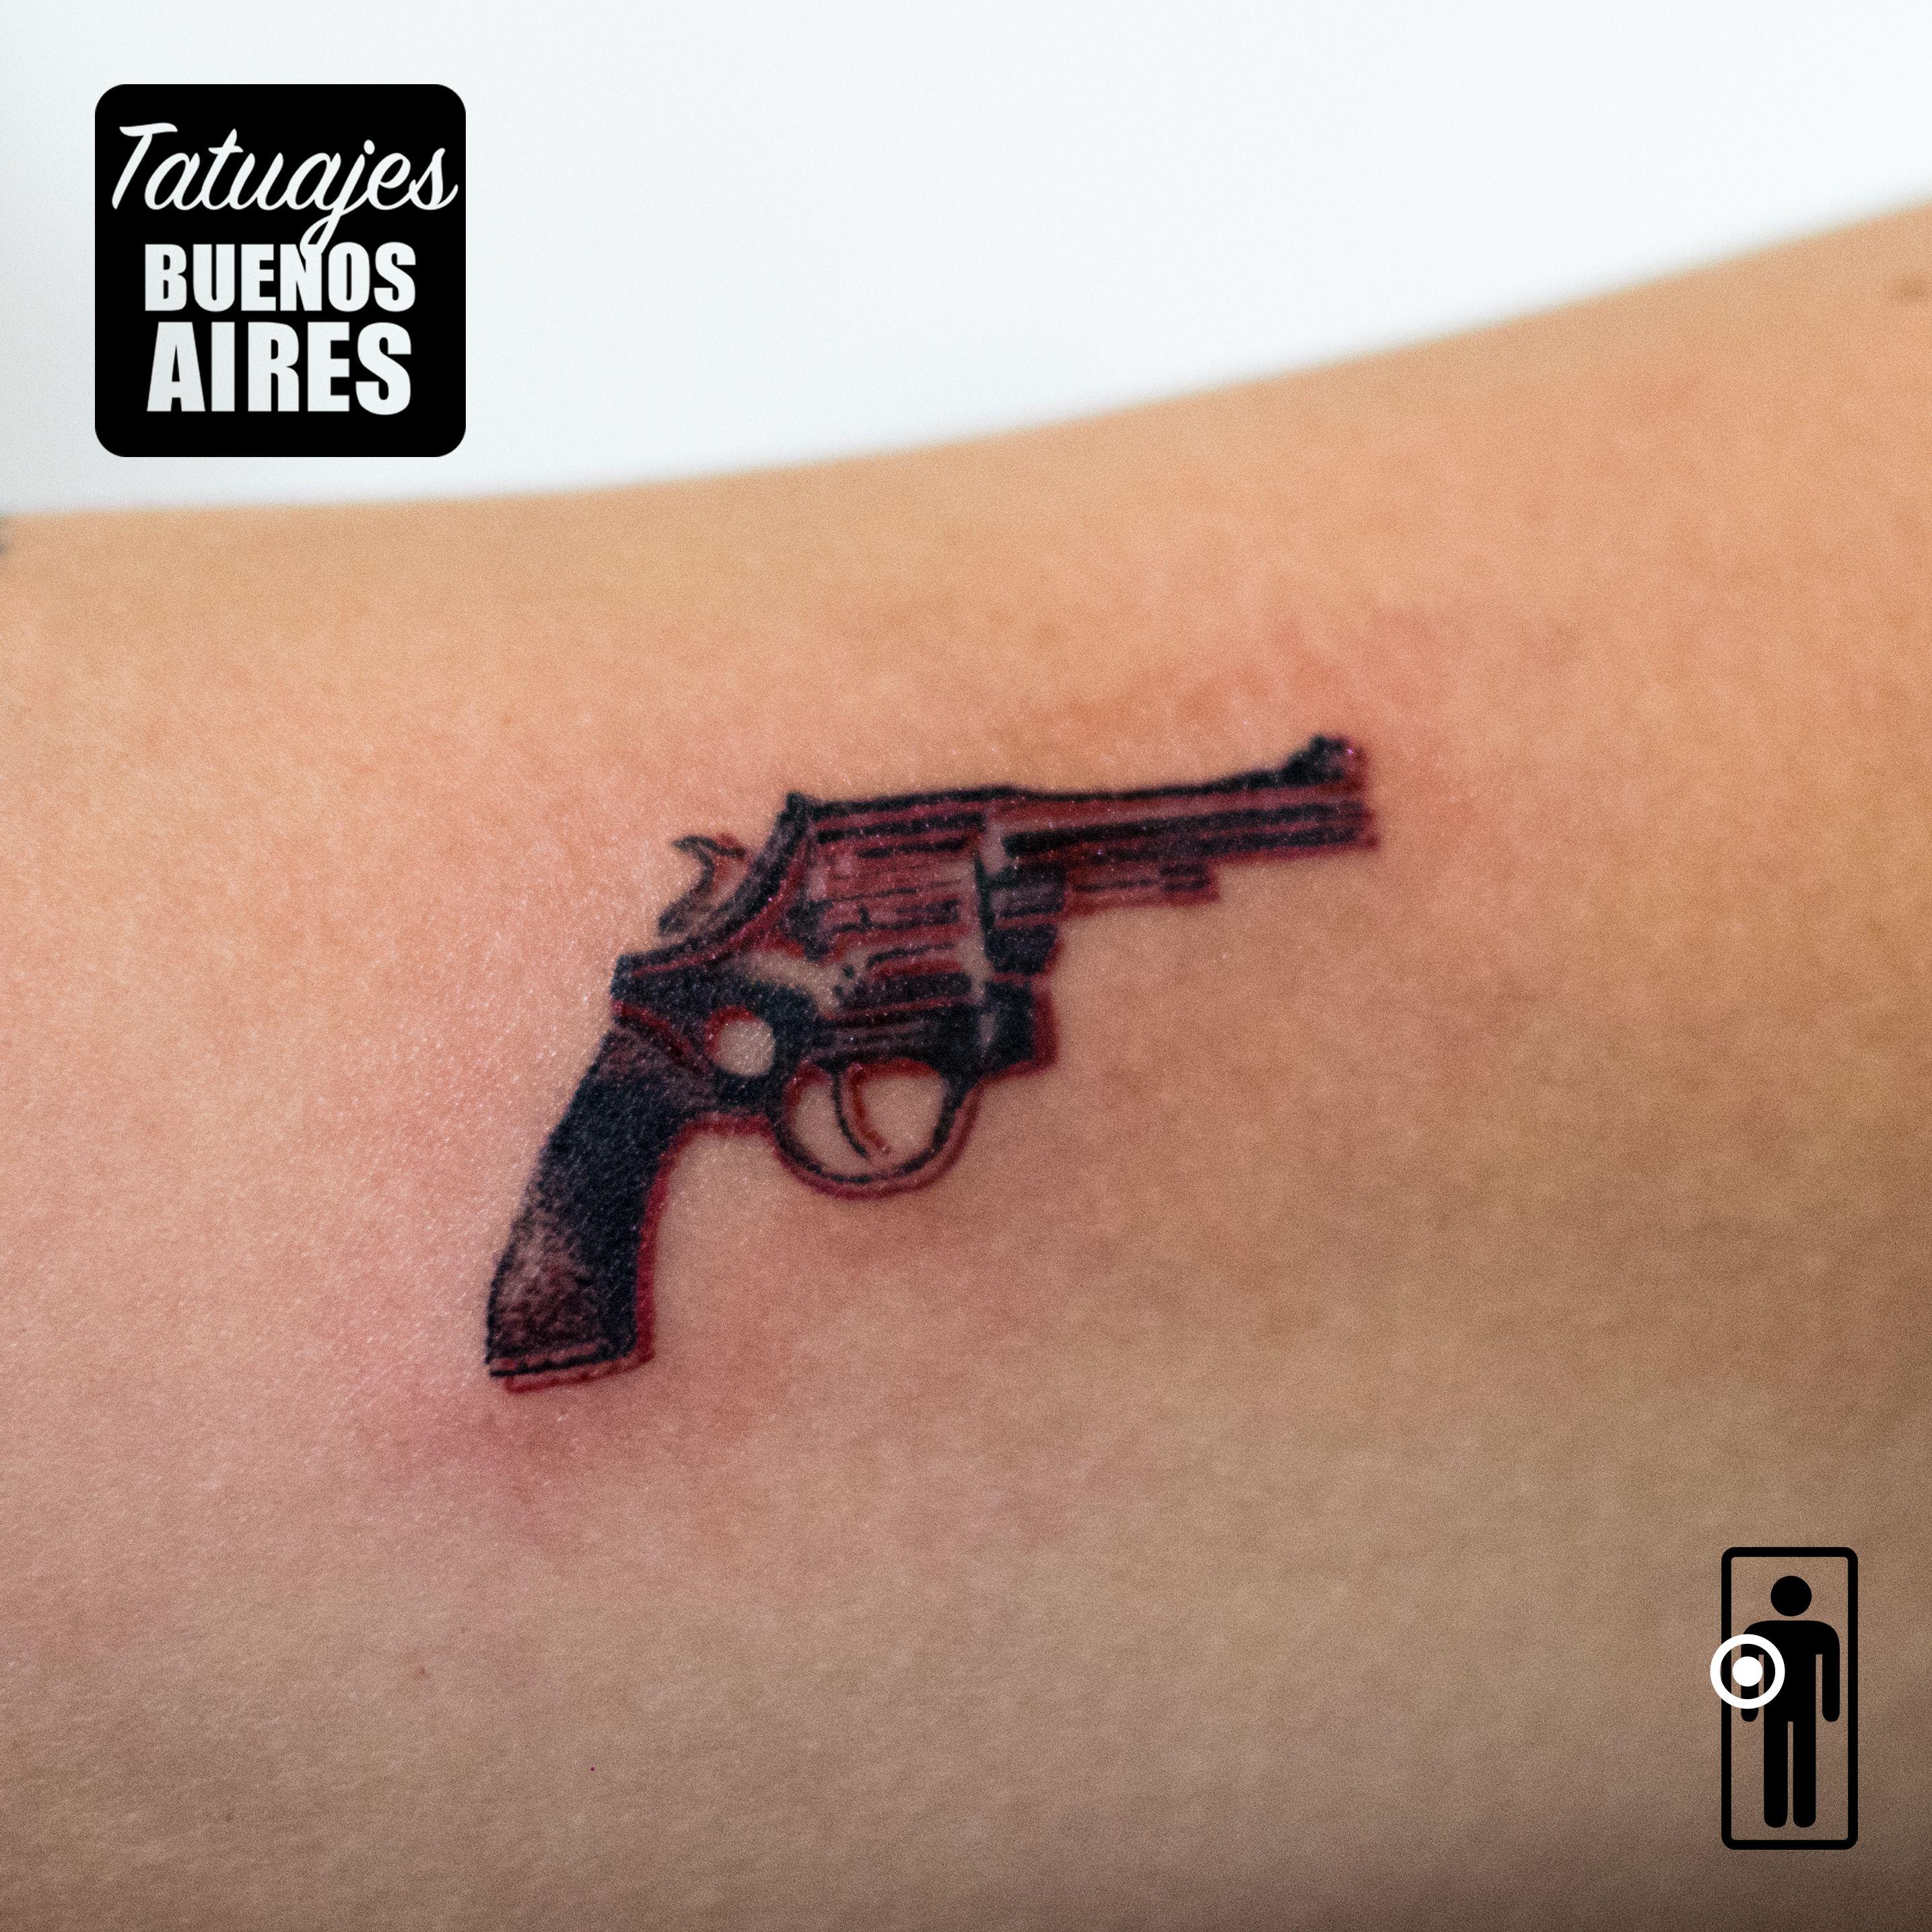 Revolver Tatuaje tatuaje pistola: #tattoo #revolver #arma #brazo #mujer #mujeres